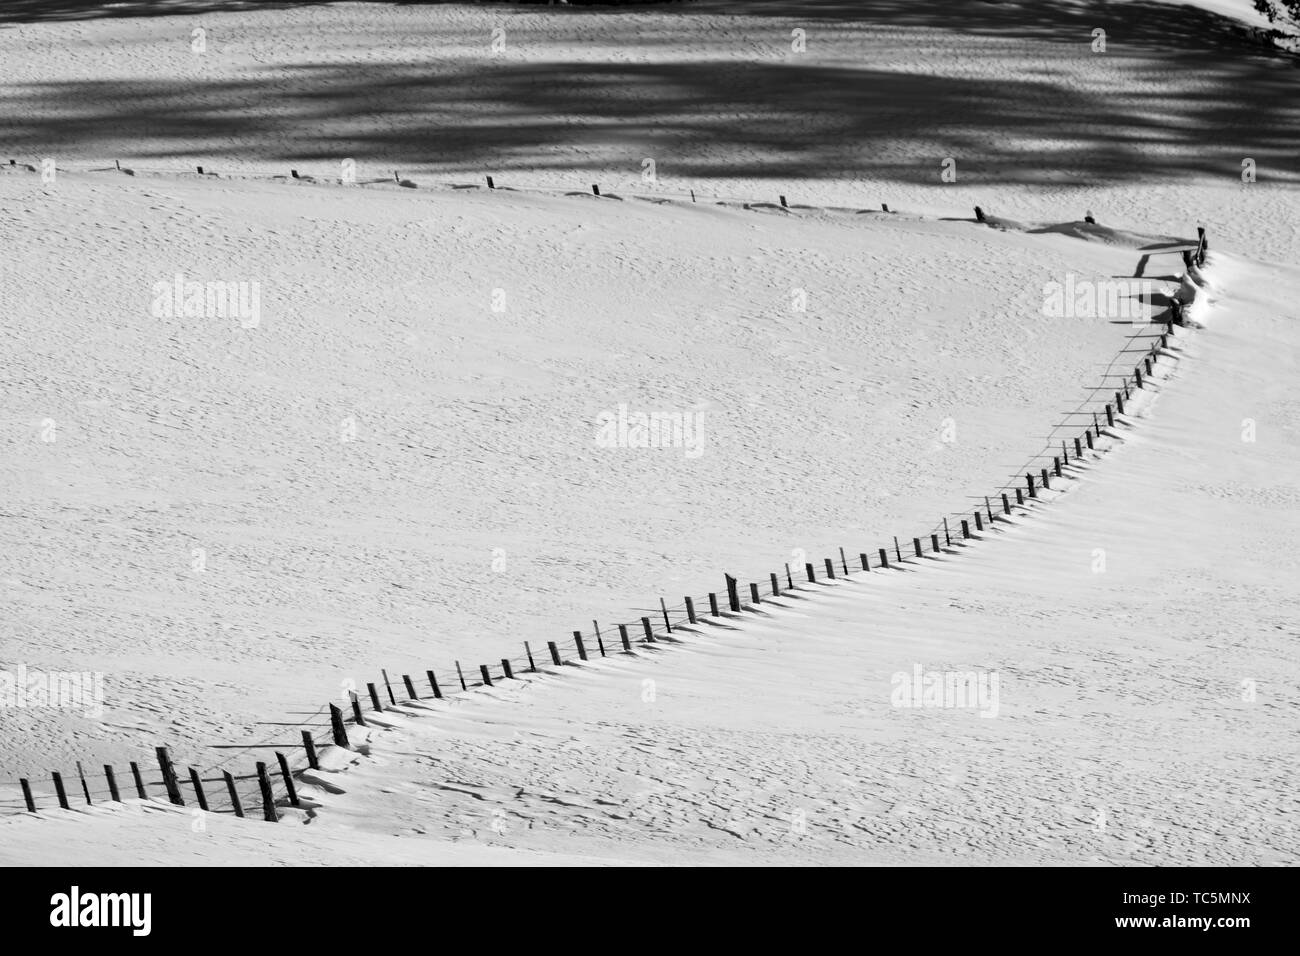 Fresh snow blankets Bryce Canyon National Park, Utah. - Stock Image